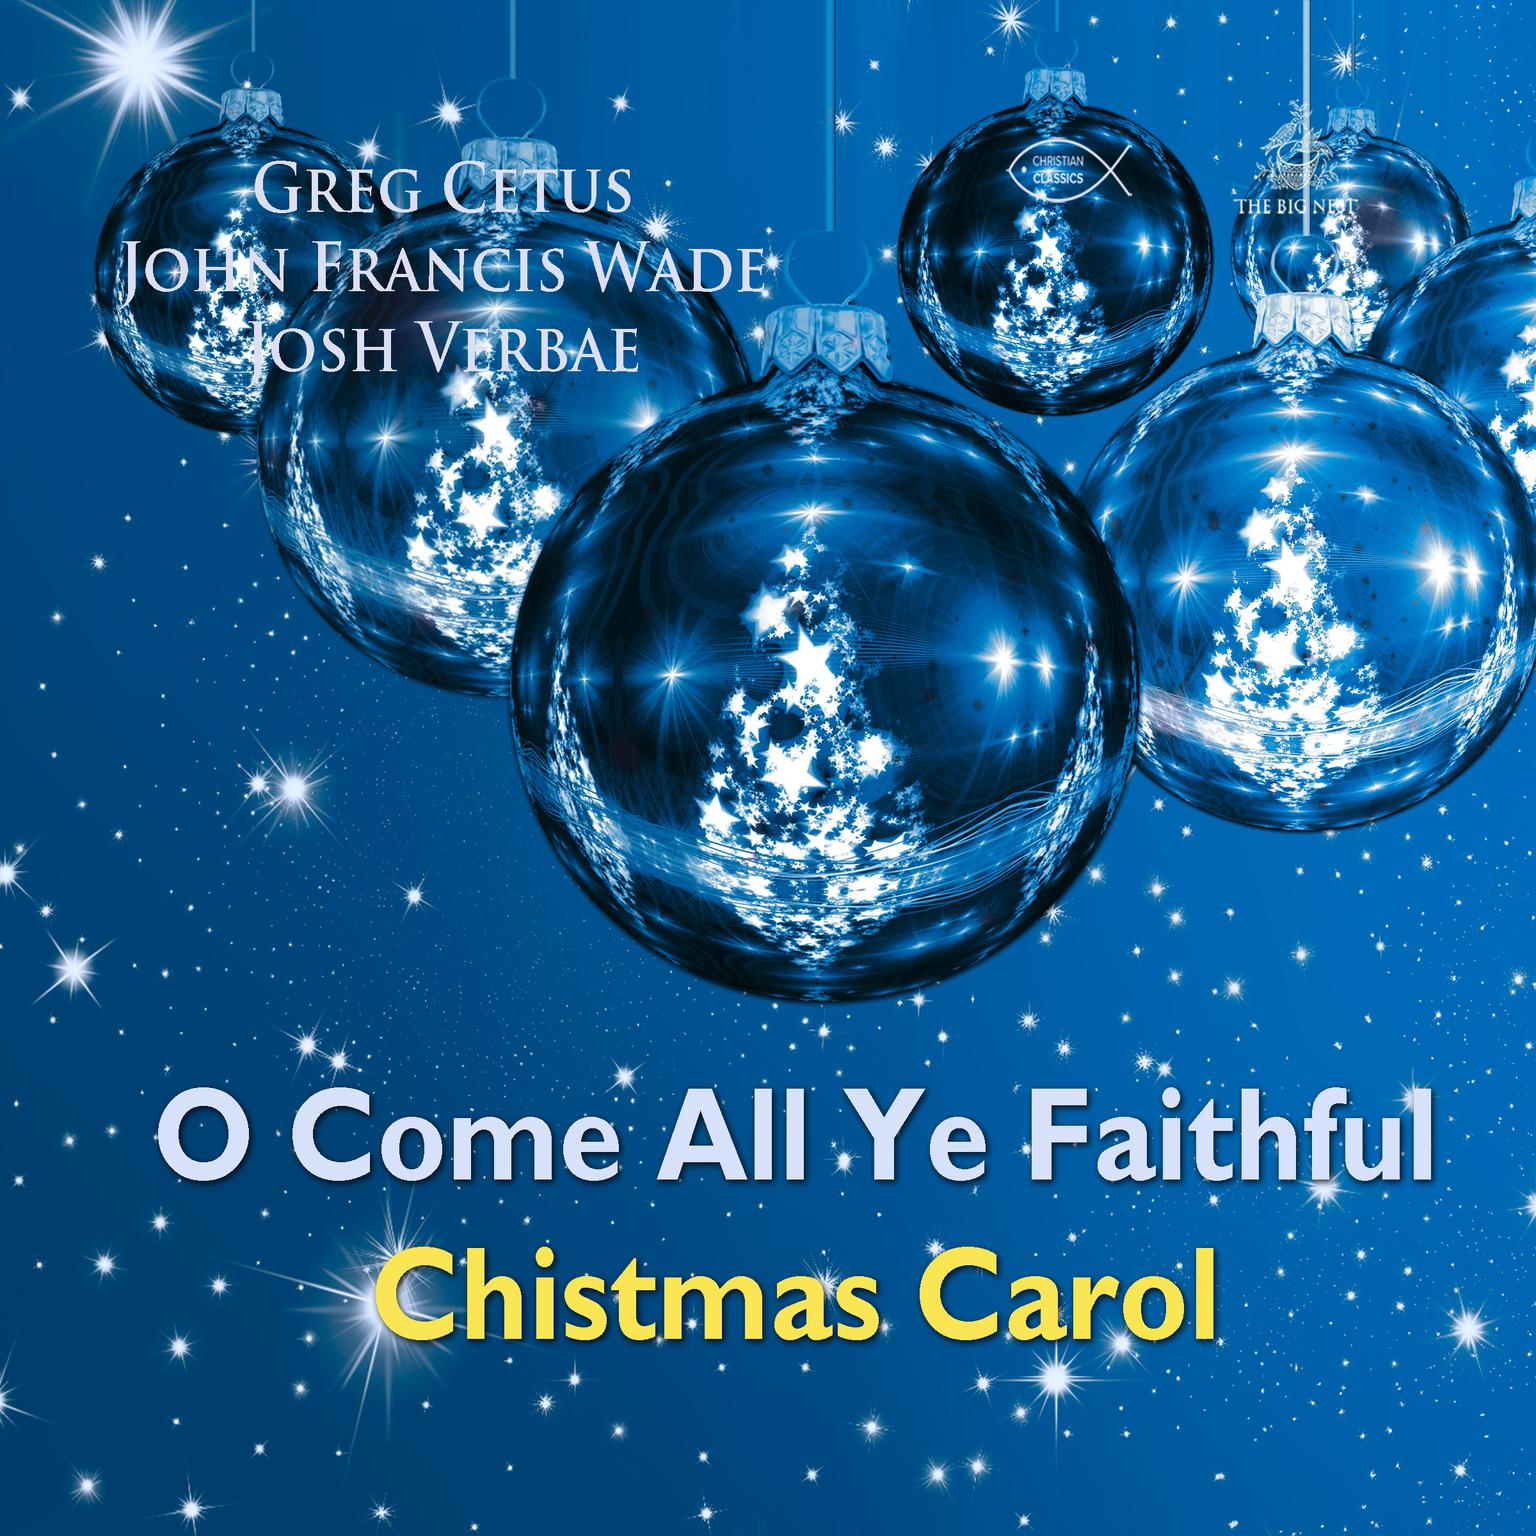 O Come All Ye Faithful Christmas Carol - Audiobook | Listen Instantly!